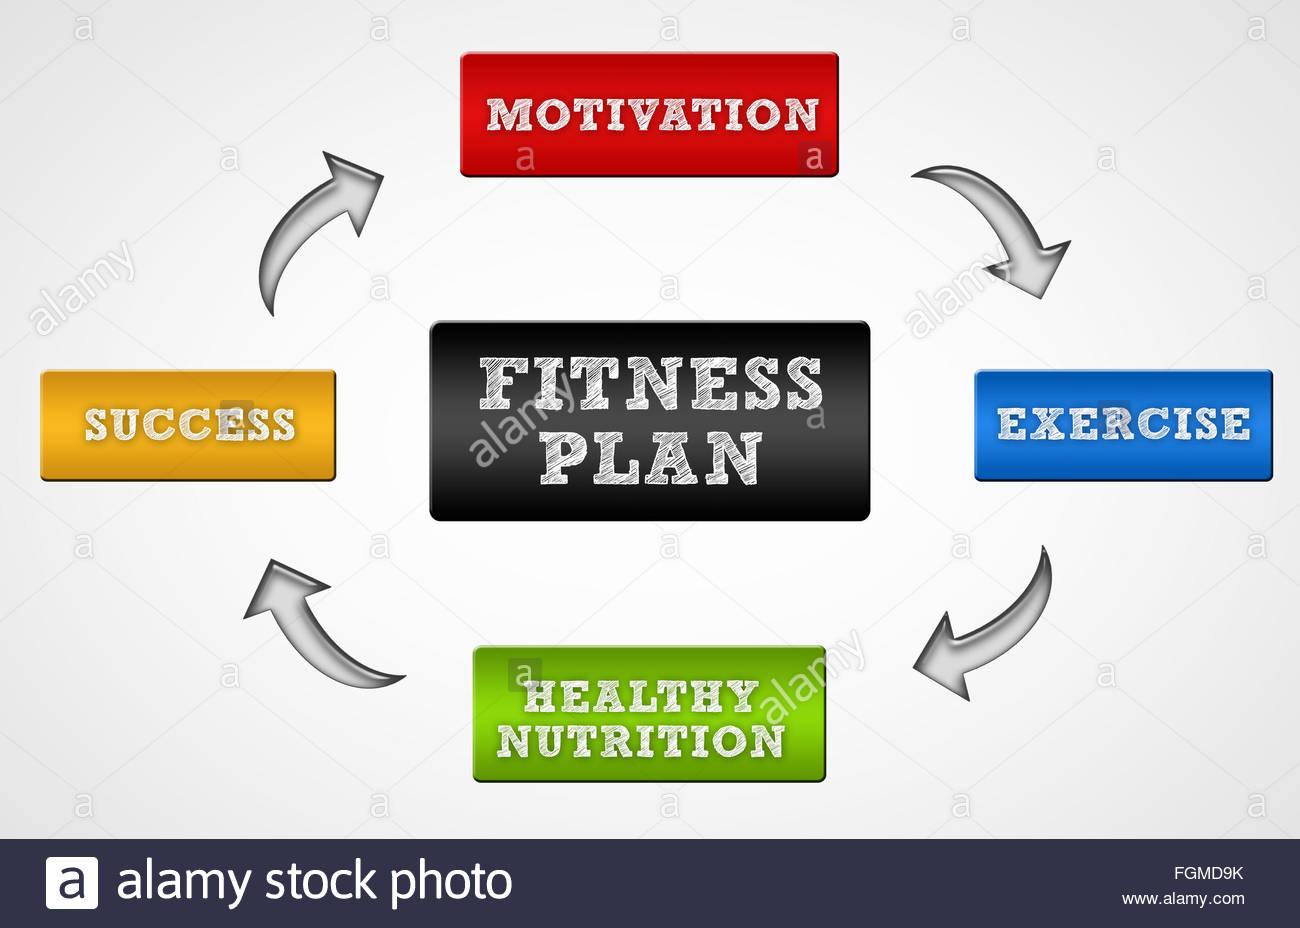 Plan de Fitness - Estrategia círculo Imagen De Stock